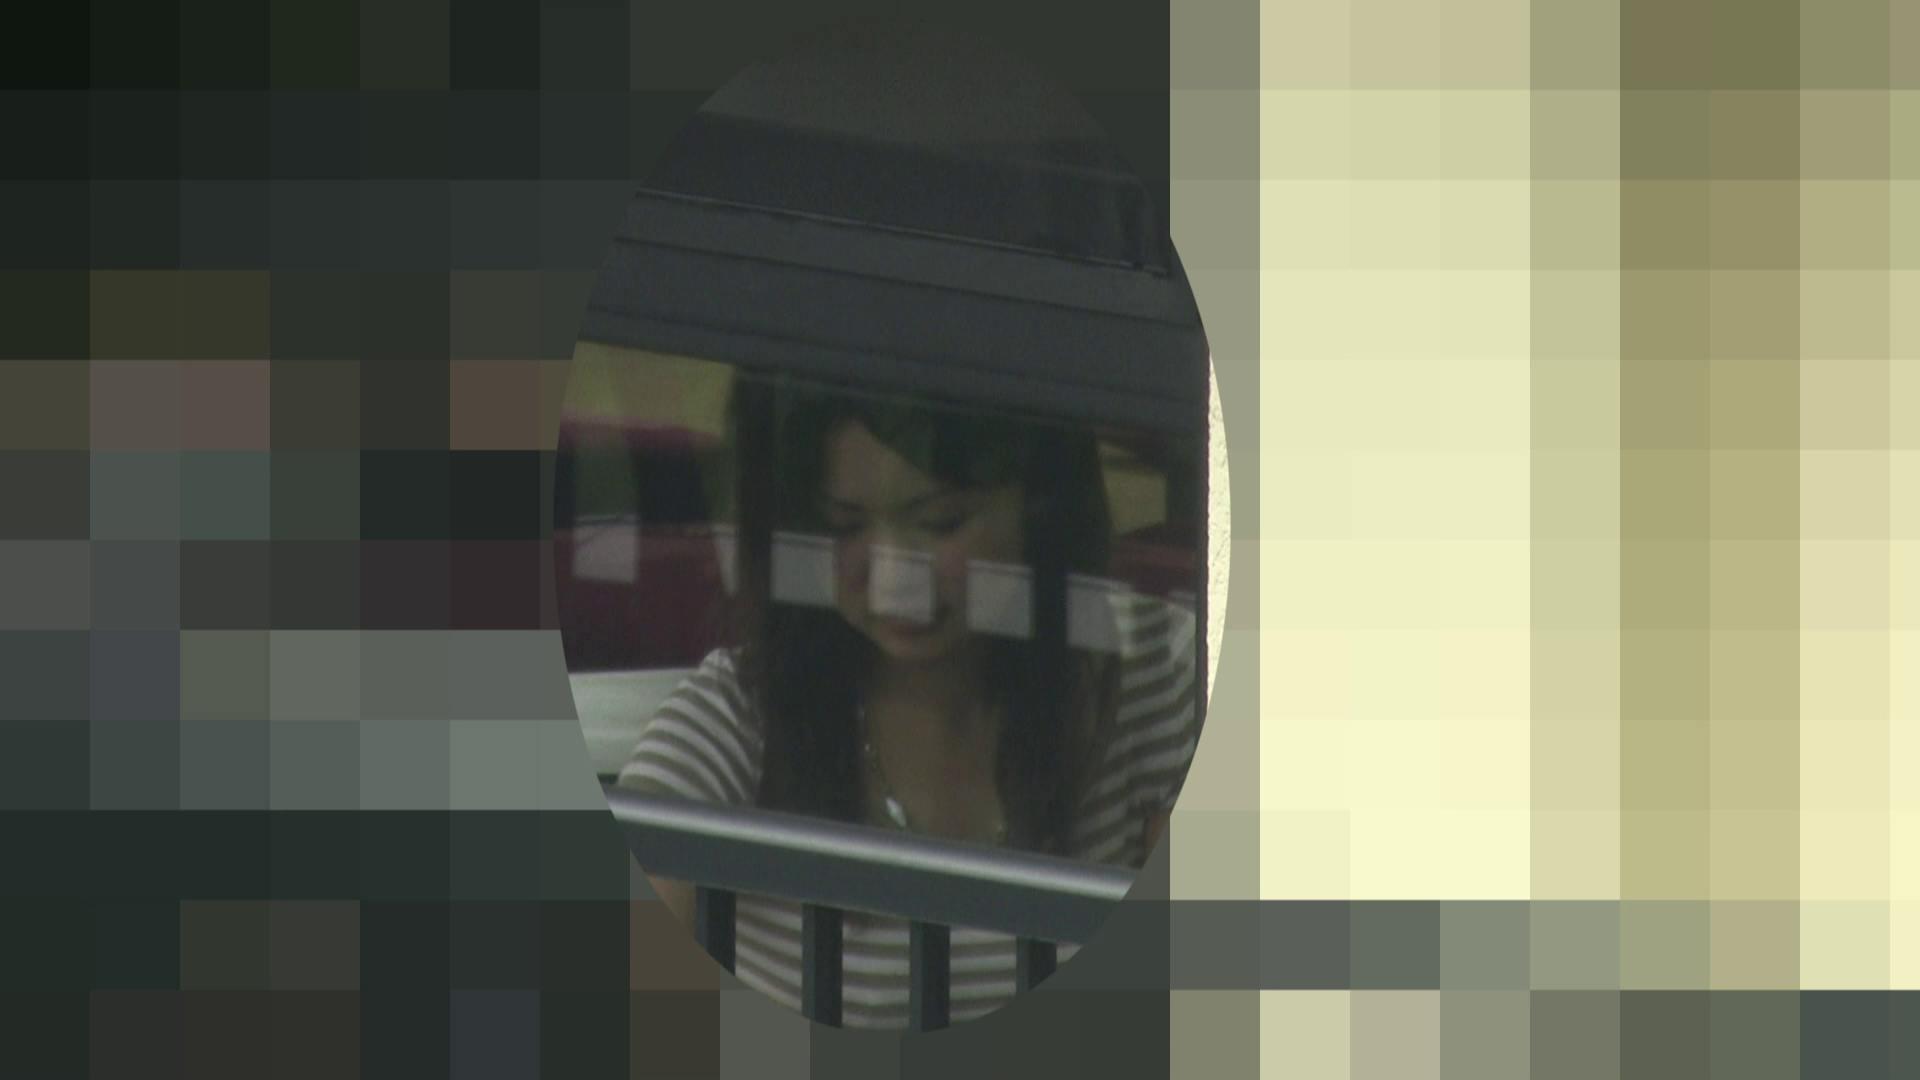 高画質露天女風呂観察 vol.032 OLセックス 盗撮戯れ無修正画像 54画像 37